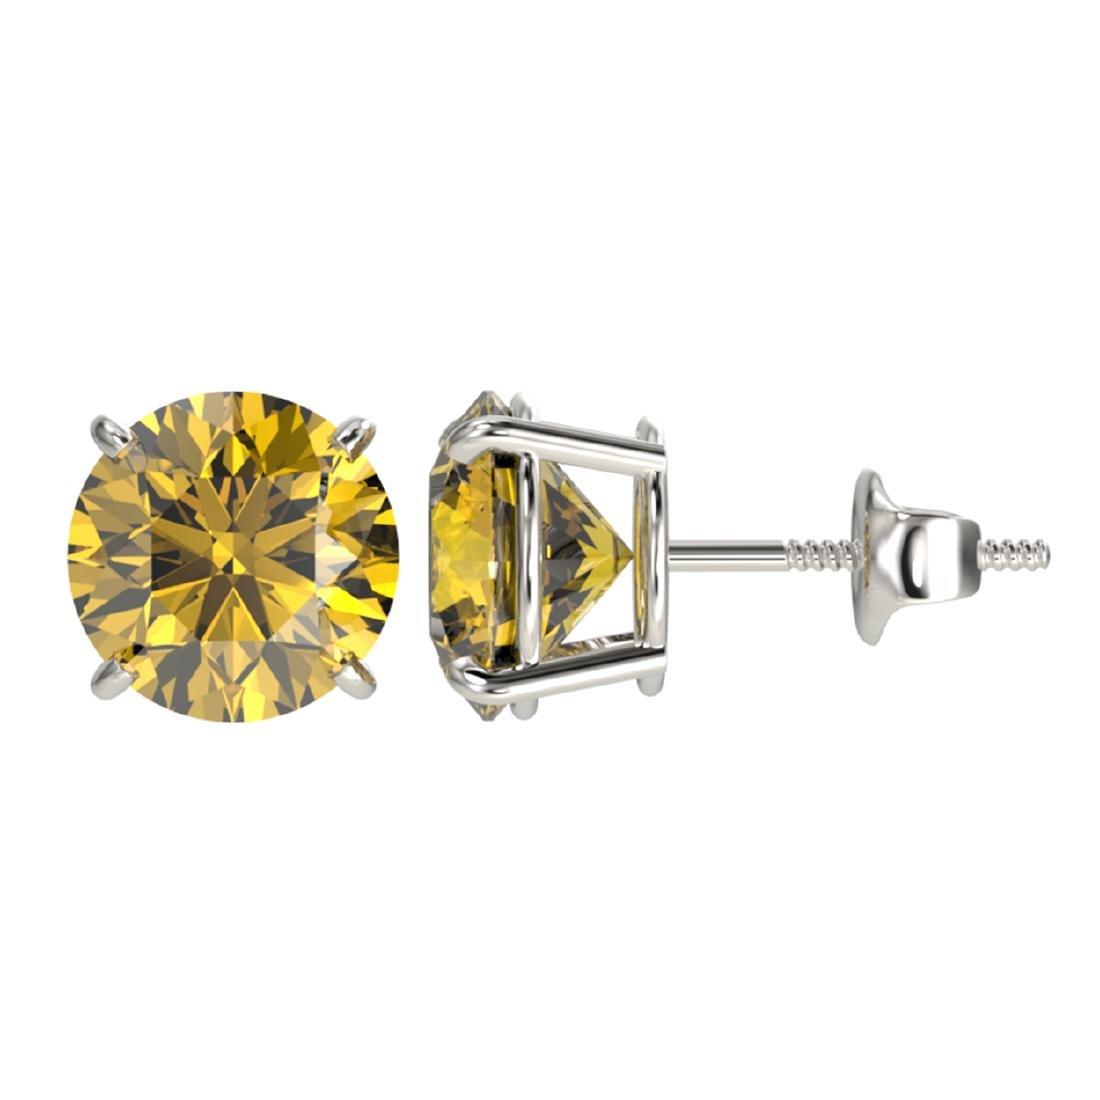 3 ctw Intense Yellow Diamond Stud Earrings 10K White - 2